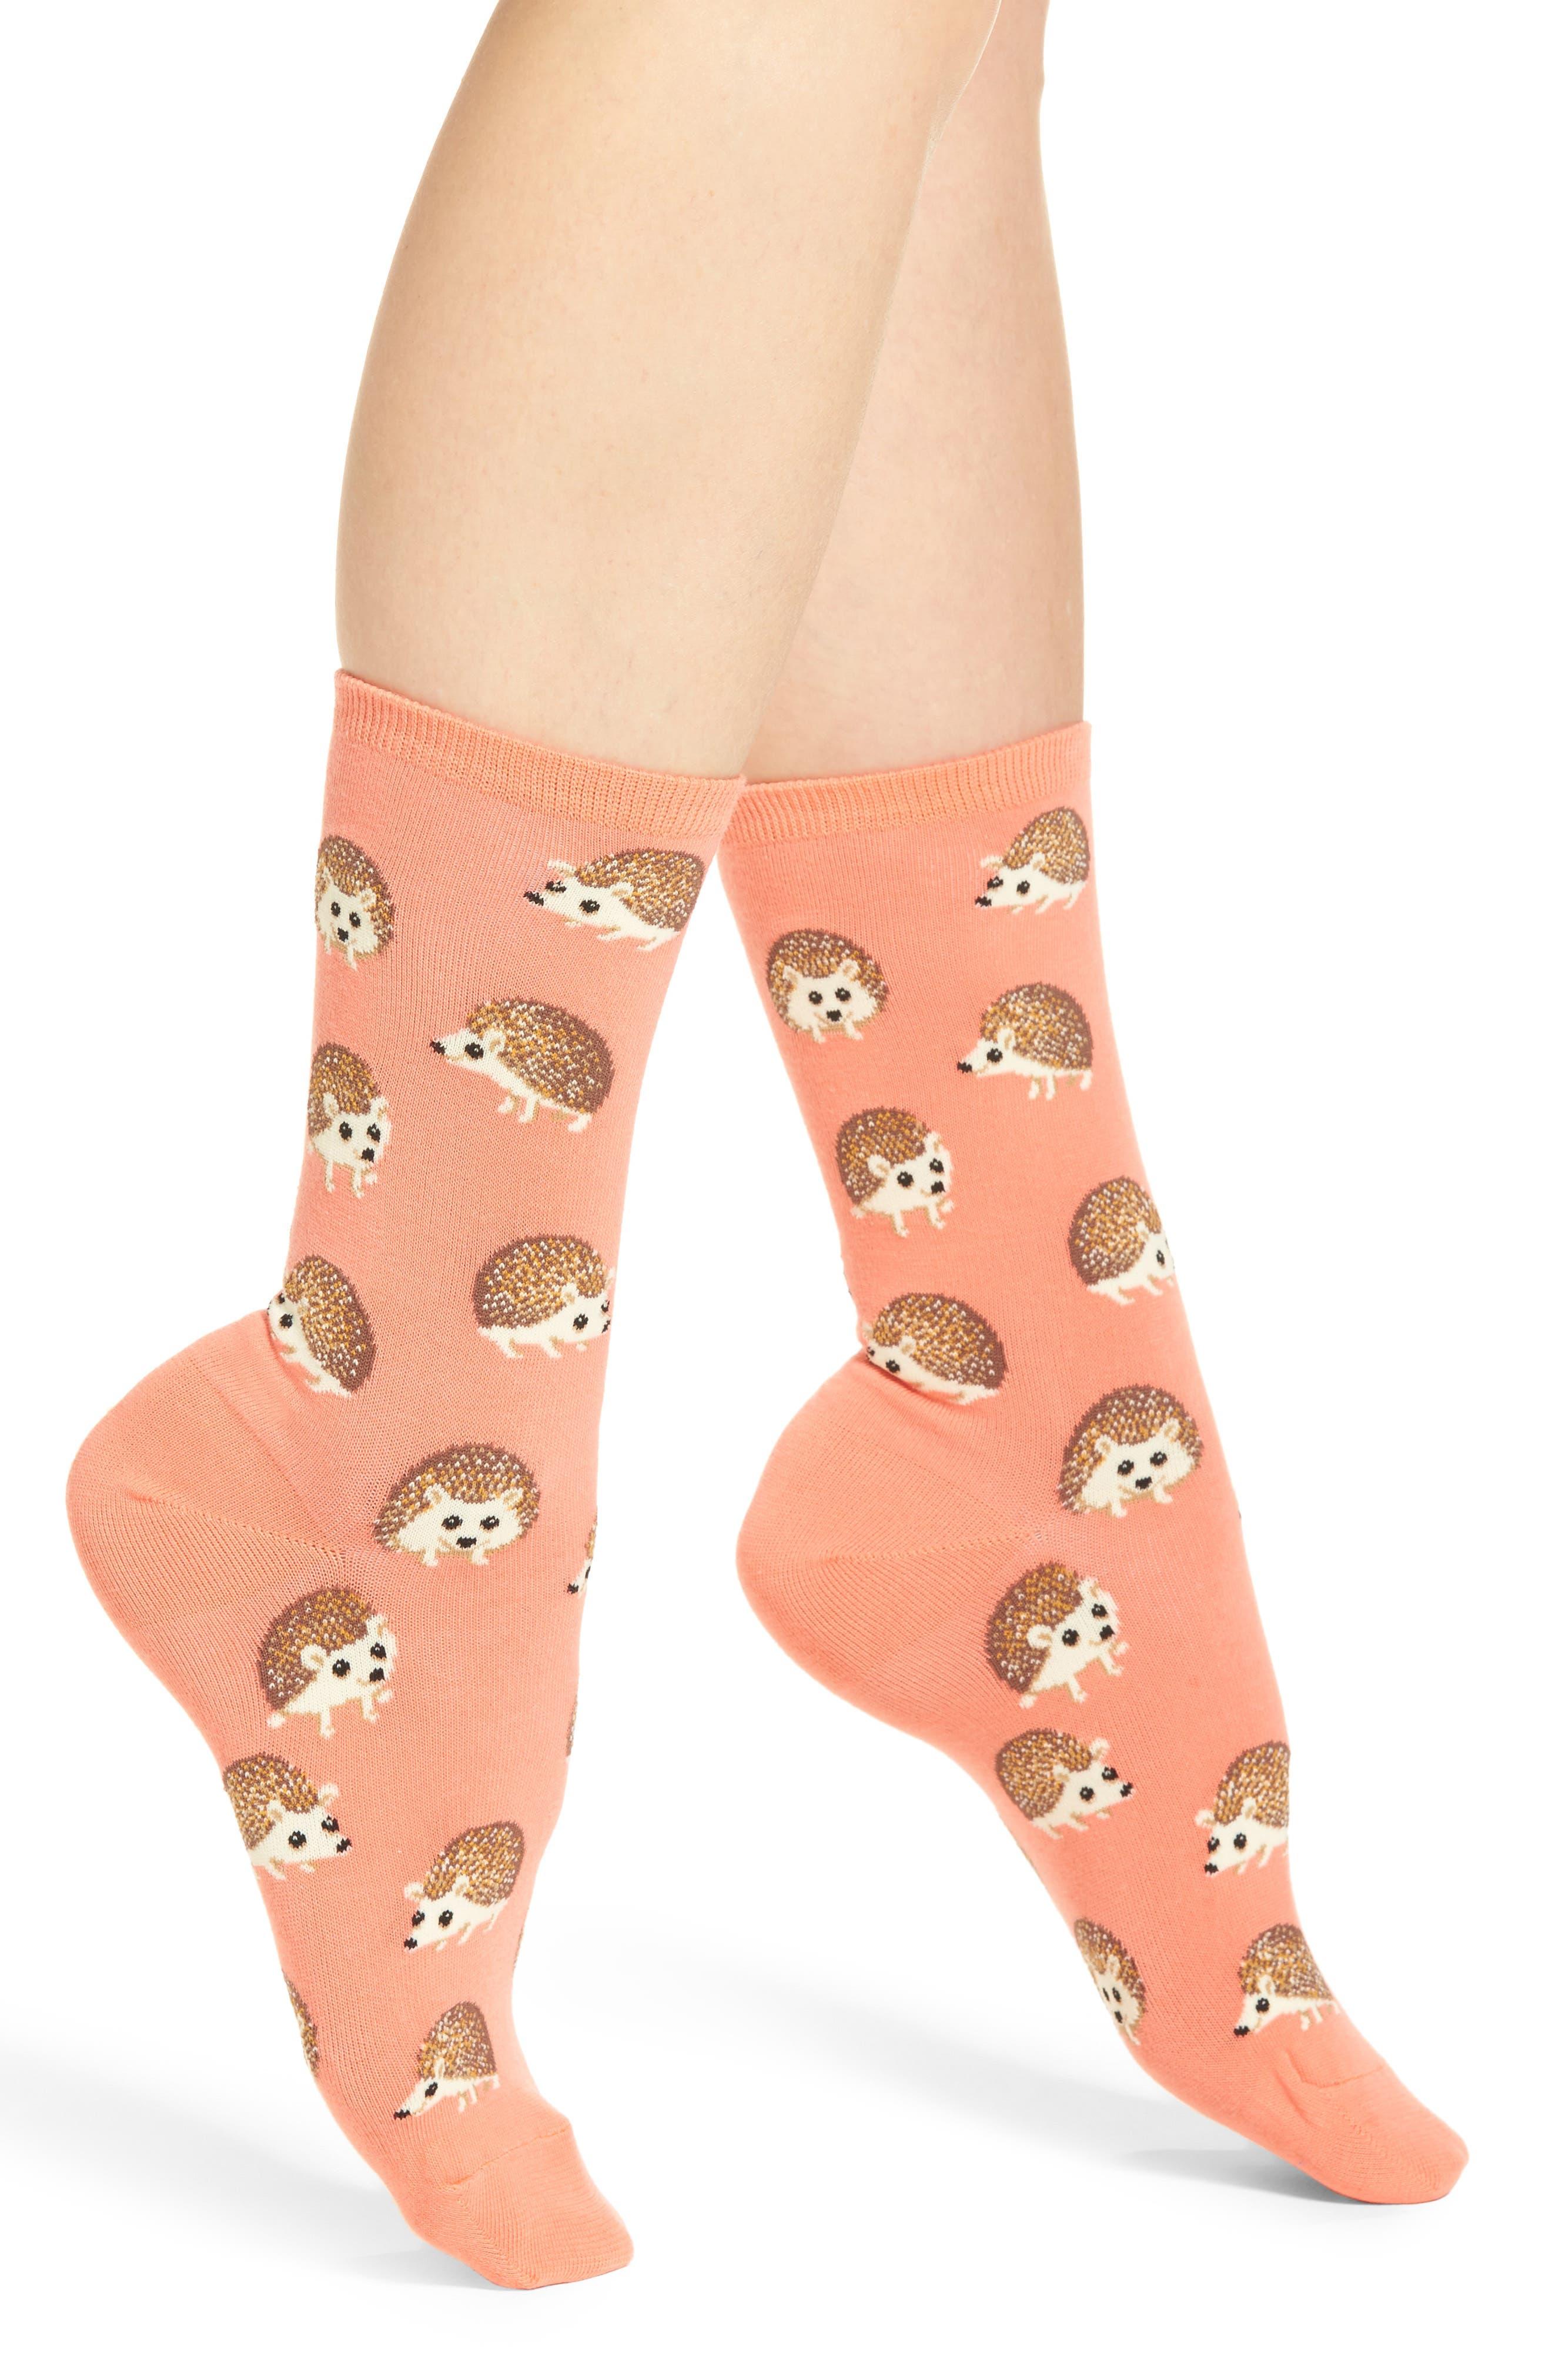 Hot Sox Hedgehog Crew Socks (3 for $15)